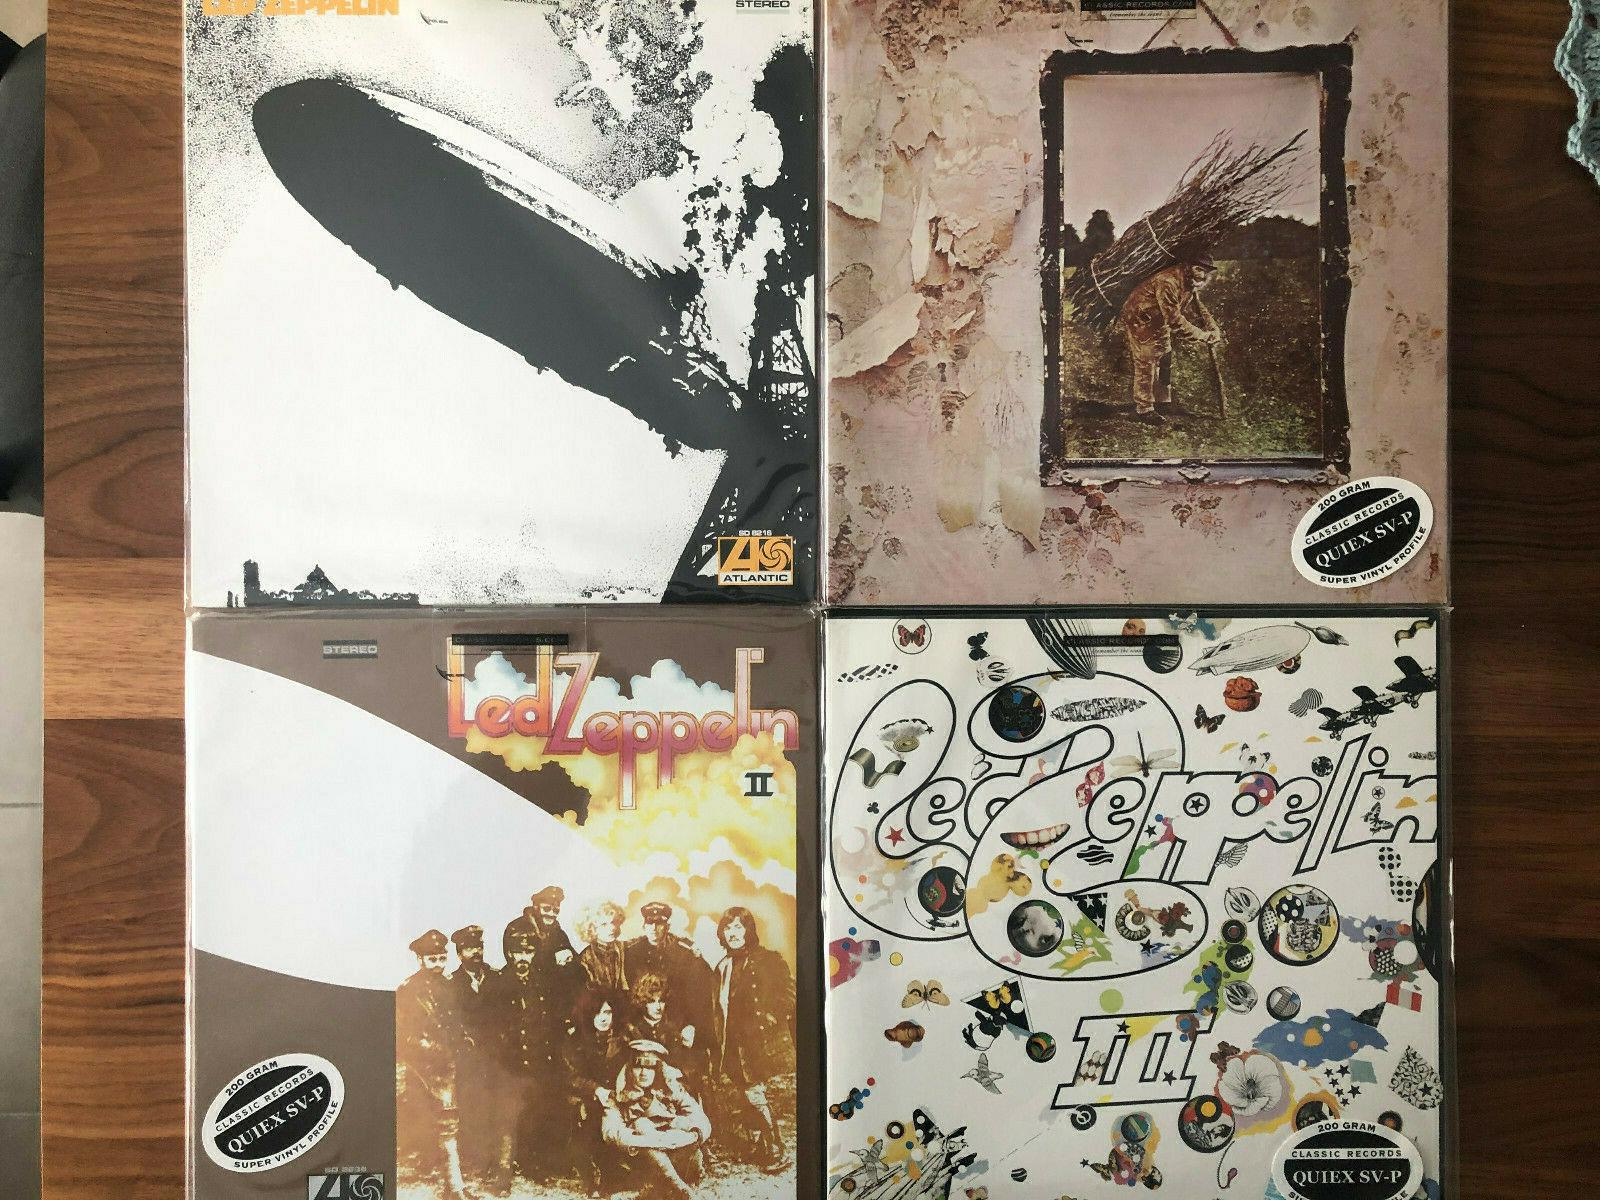 Classic Records Led Zeppelin LP Records   200 gram